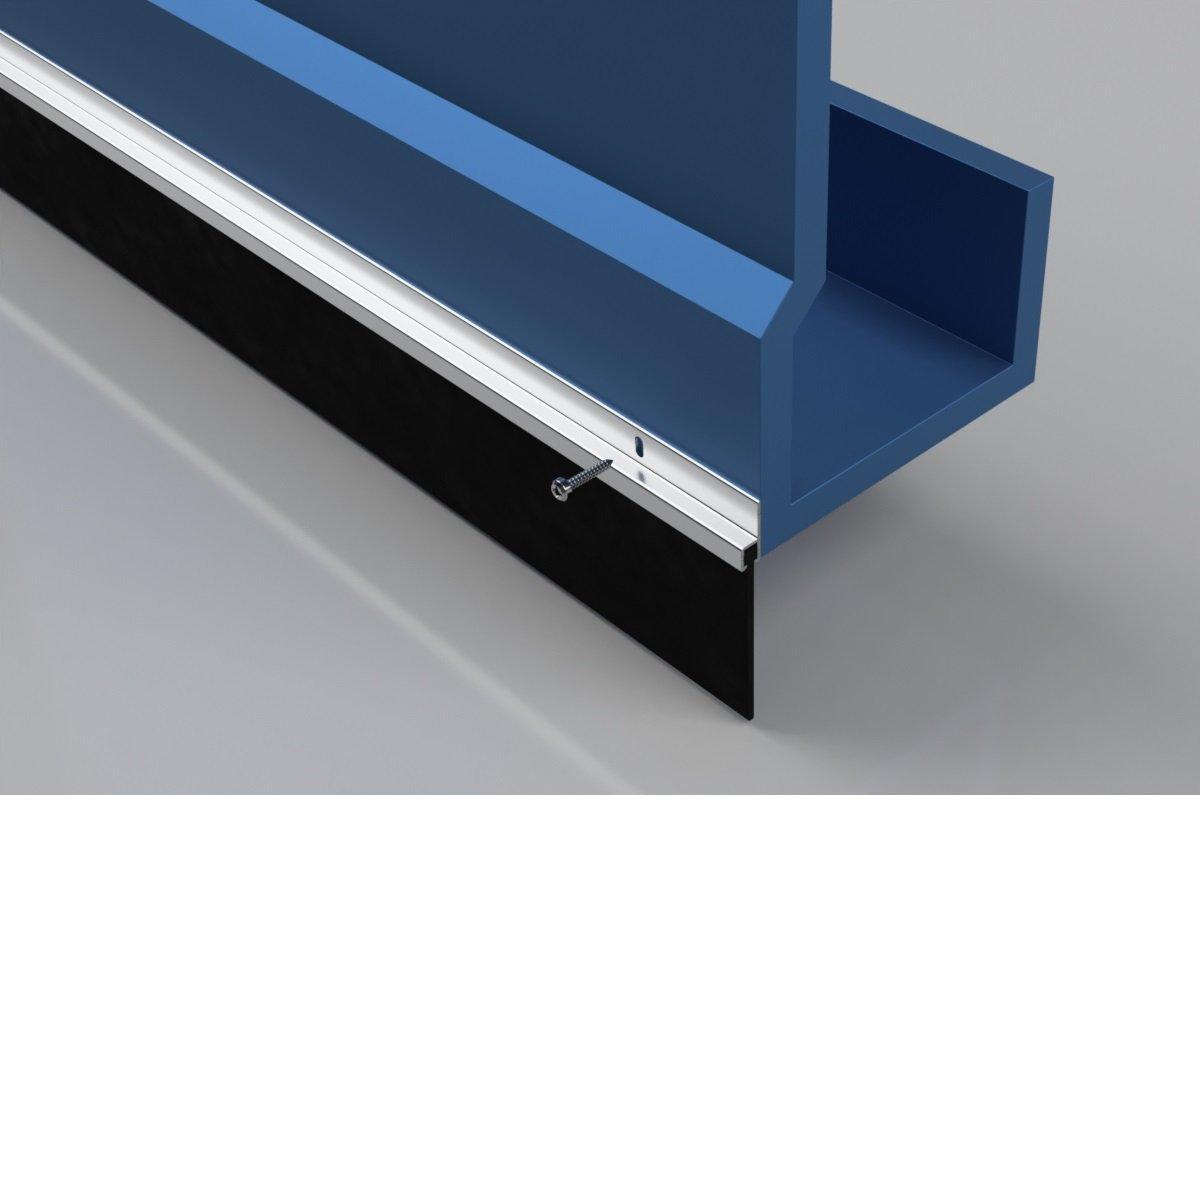 Stormguard 03SR3312134/A garage porta gomma paraspifferi Seal 2134/mm in alluminio